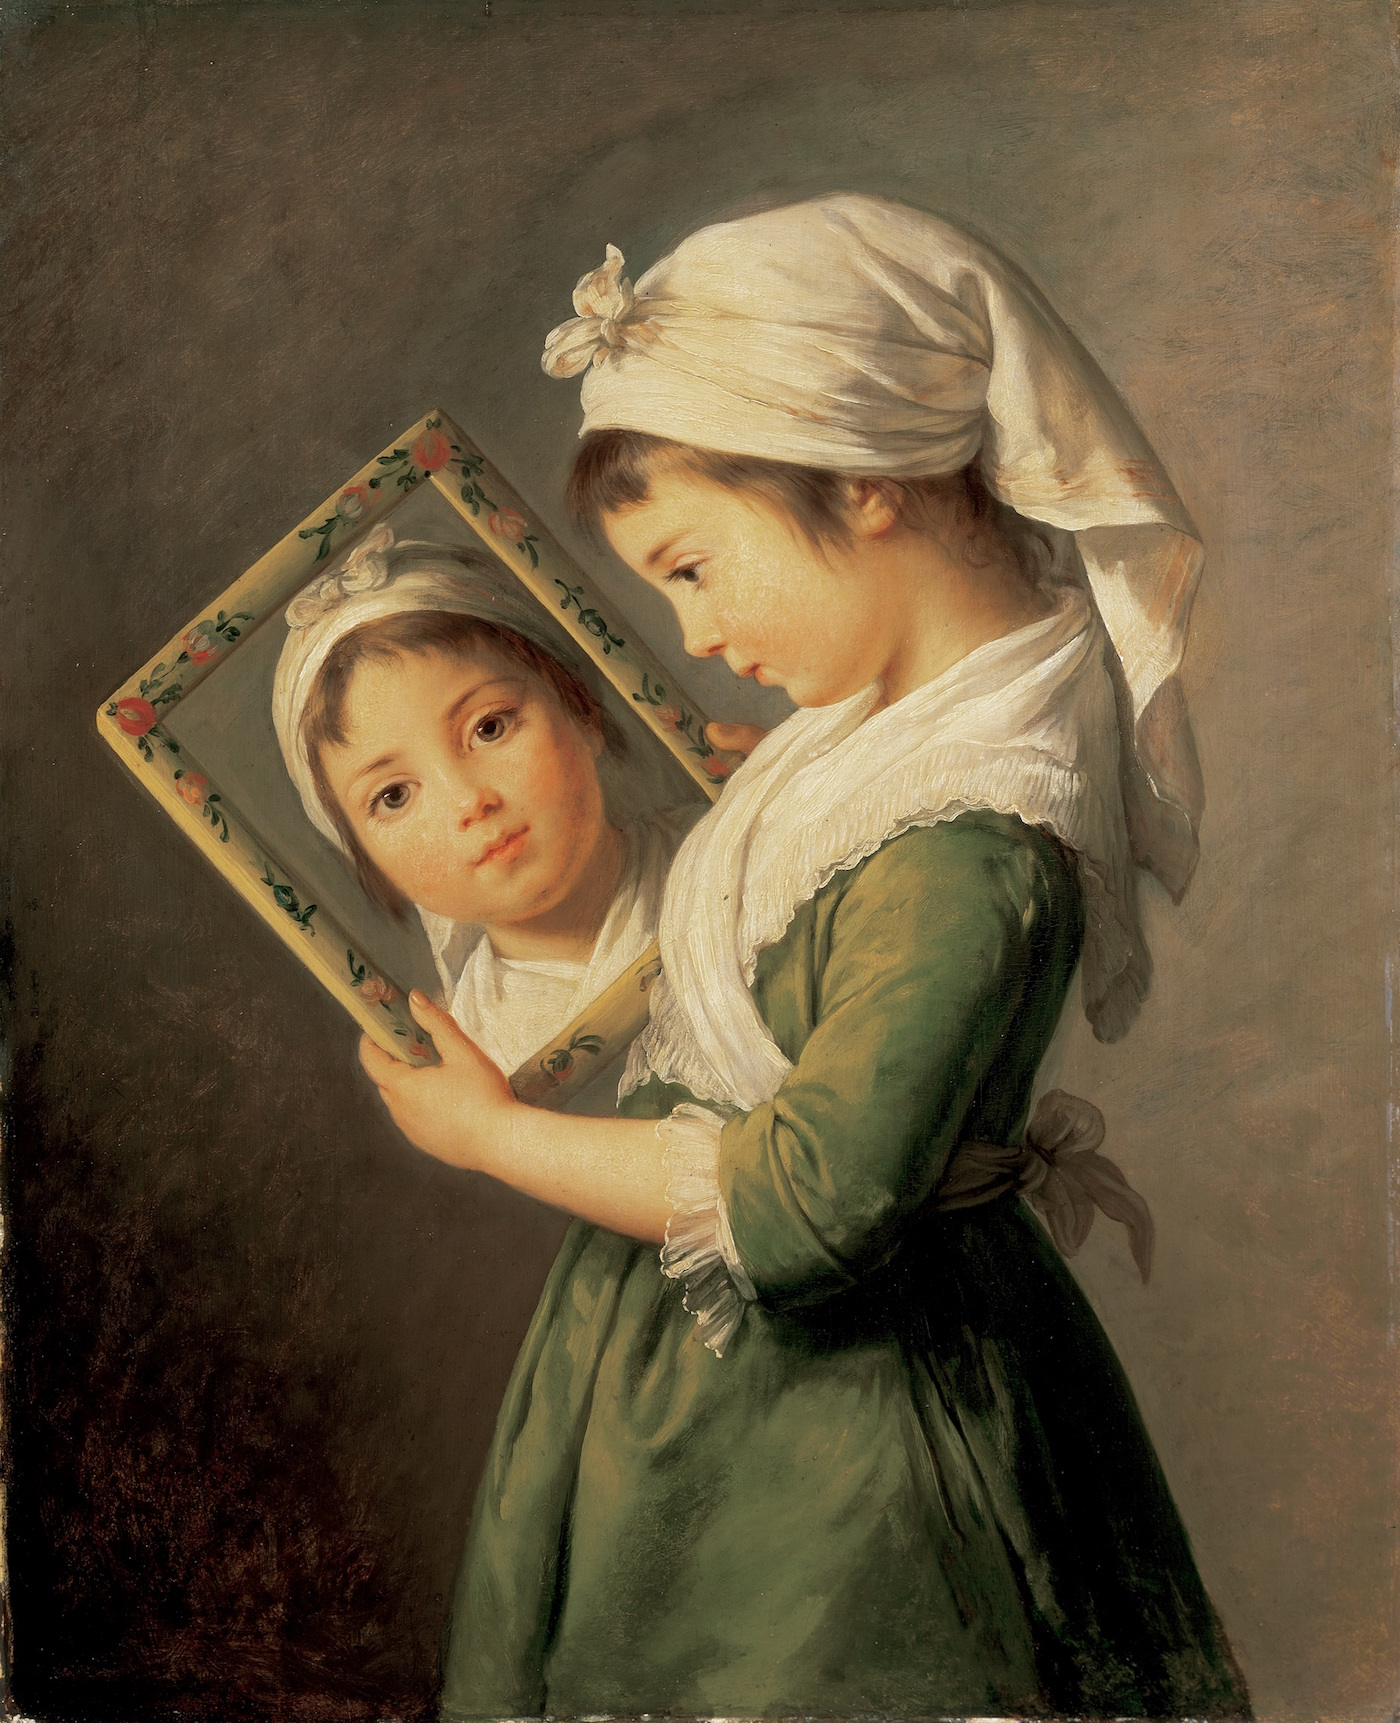 """Julie Le Brun looking in a mirror"" by her mother, Elisabeth Vigée Le Brun"